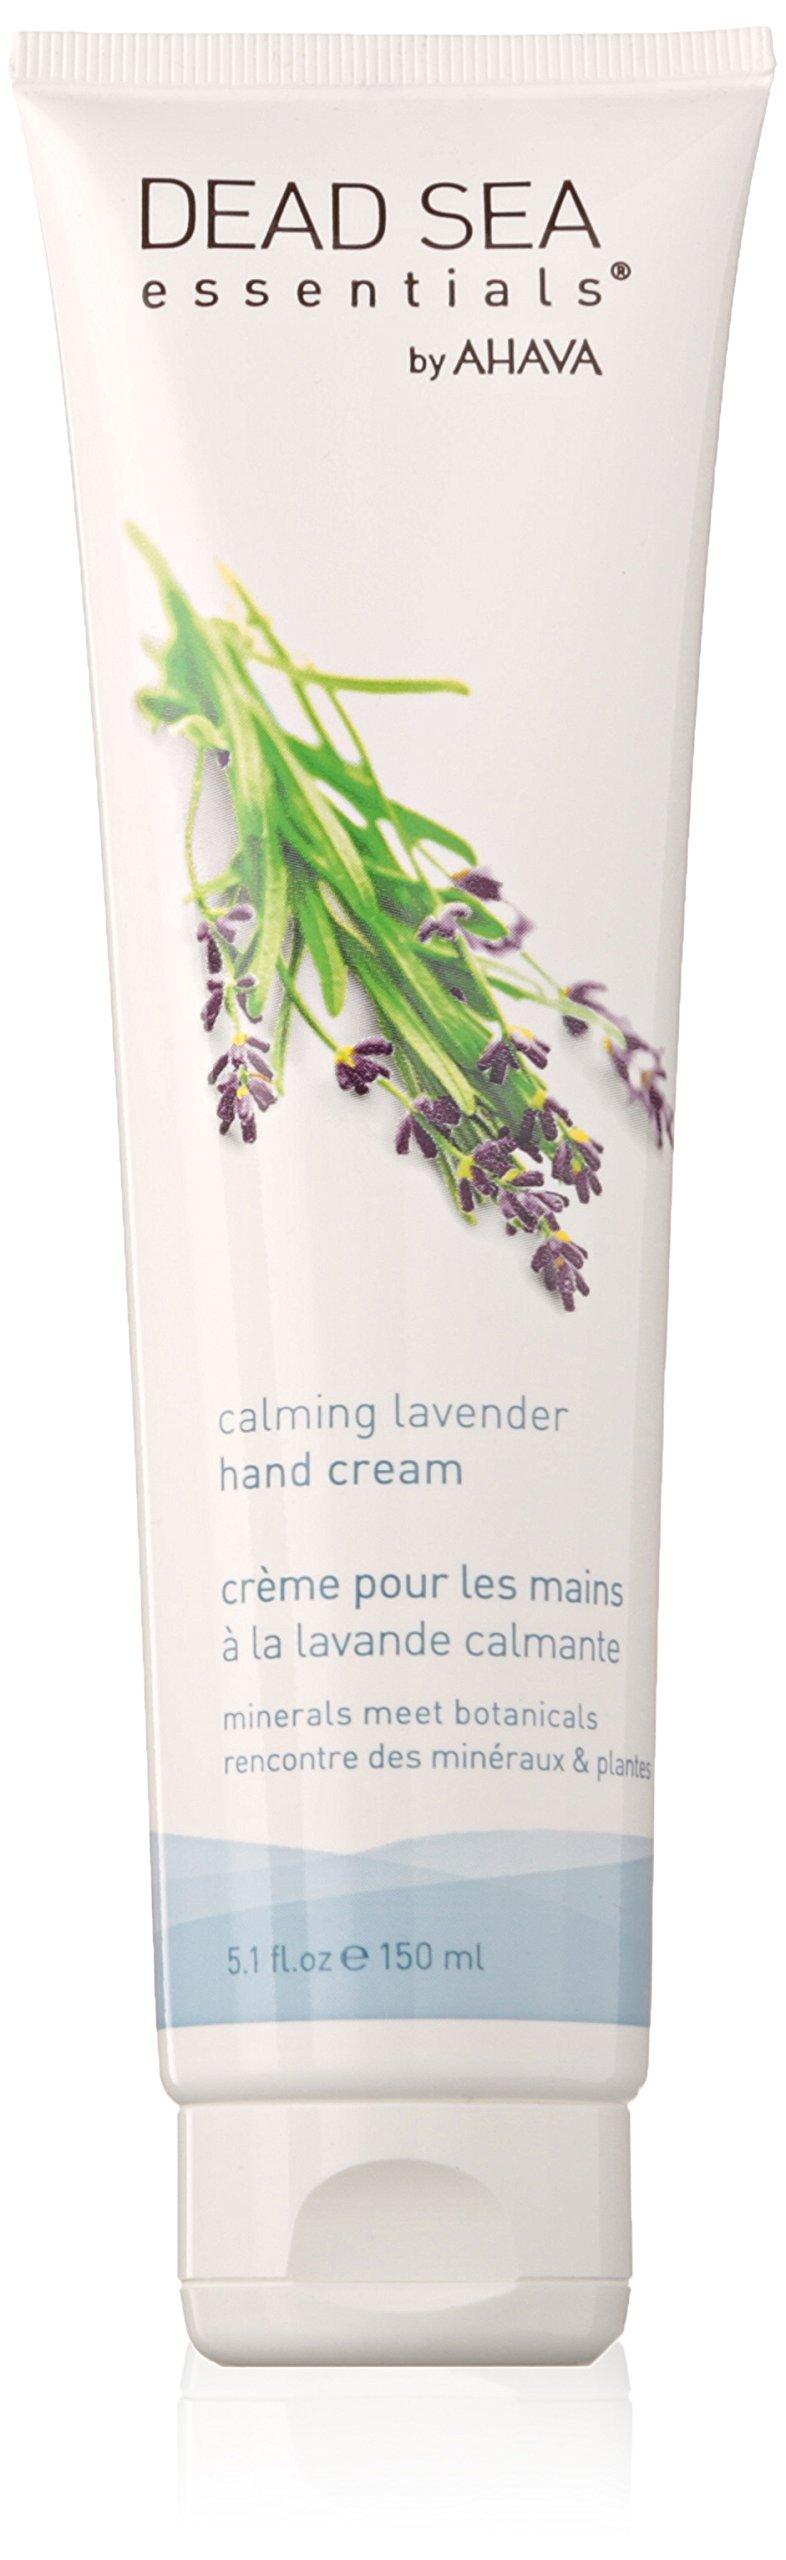 Dead Sea Essentials by AHAVA Calming Lavender Hand Cream, 5.1 oz